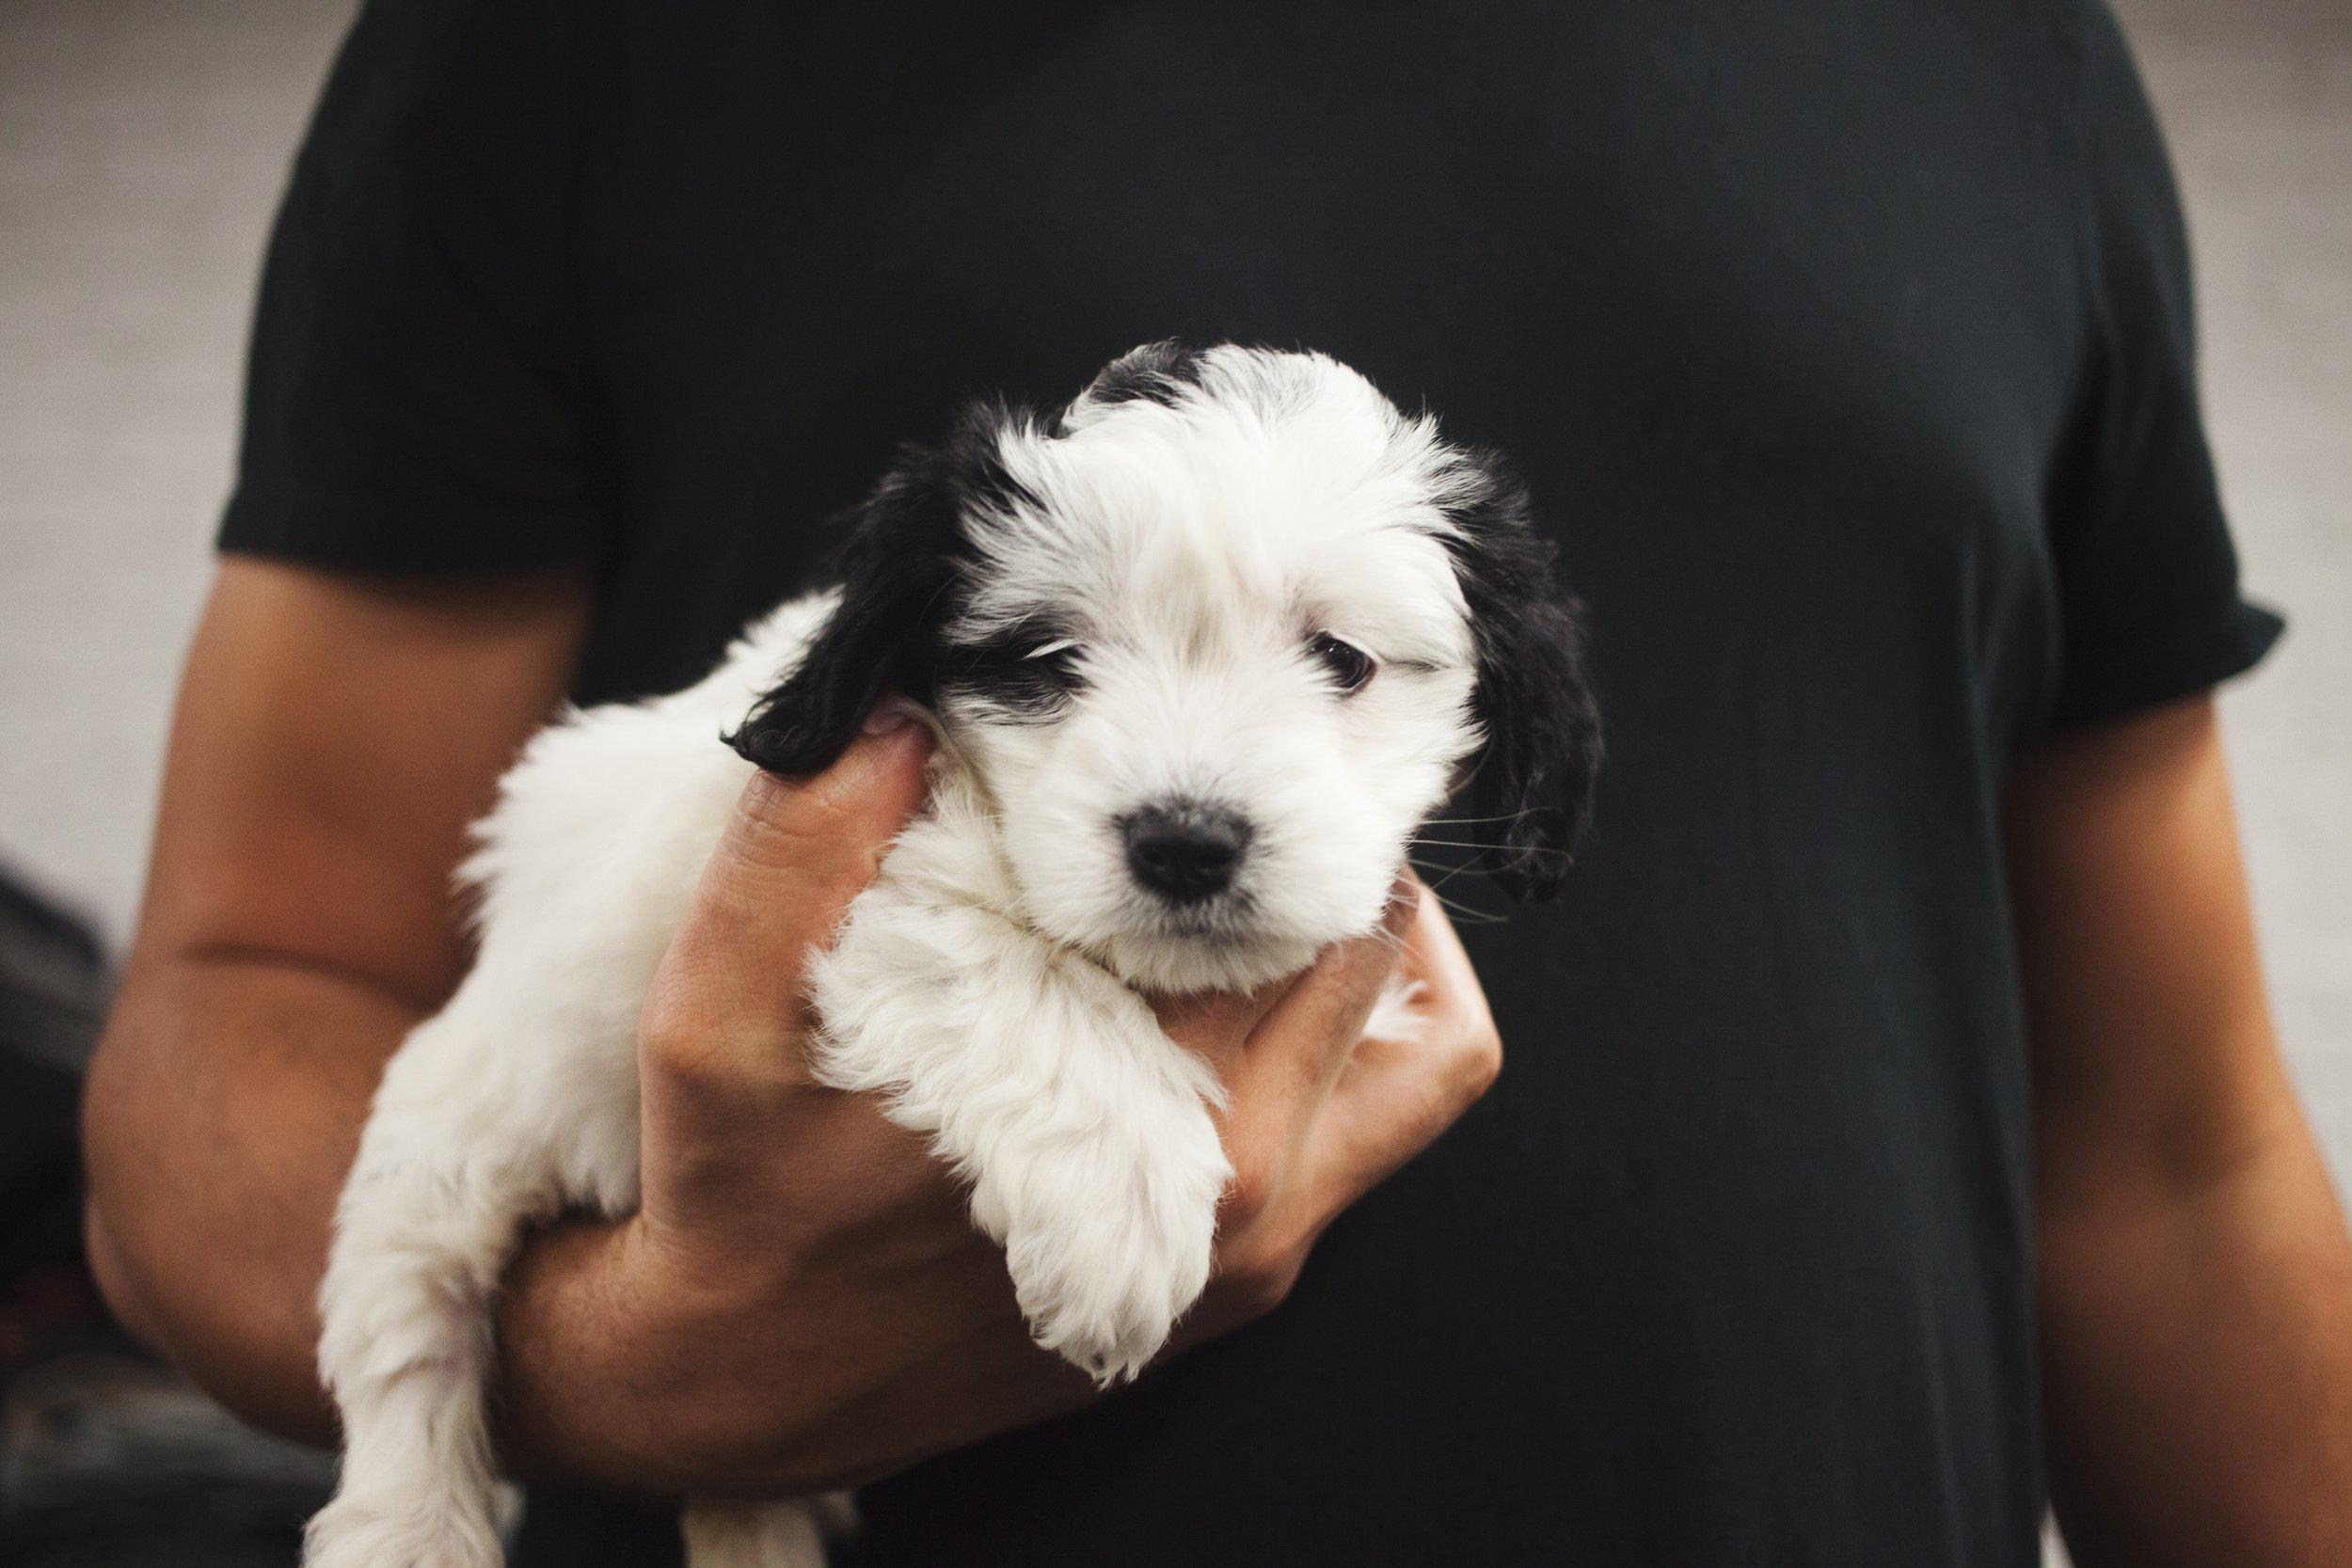 Puppies are man's best friend #puppylove #tinypuppy